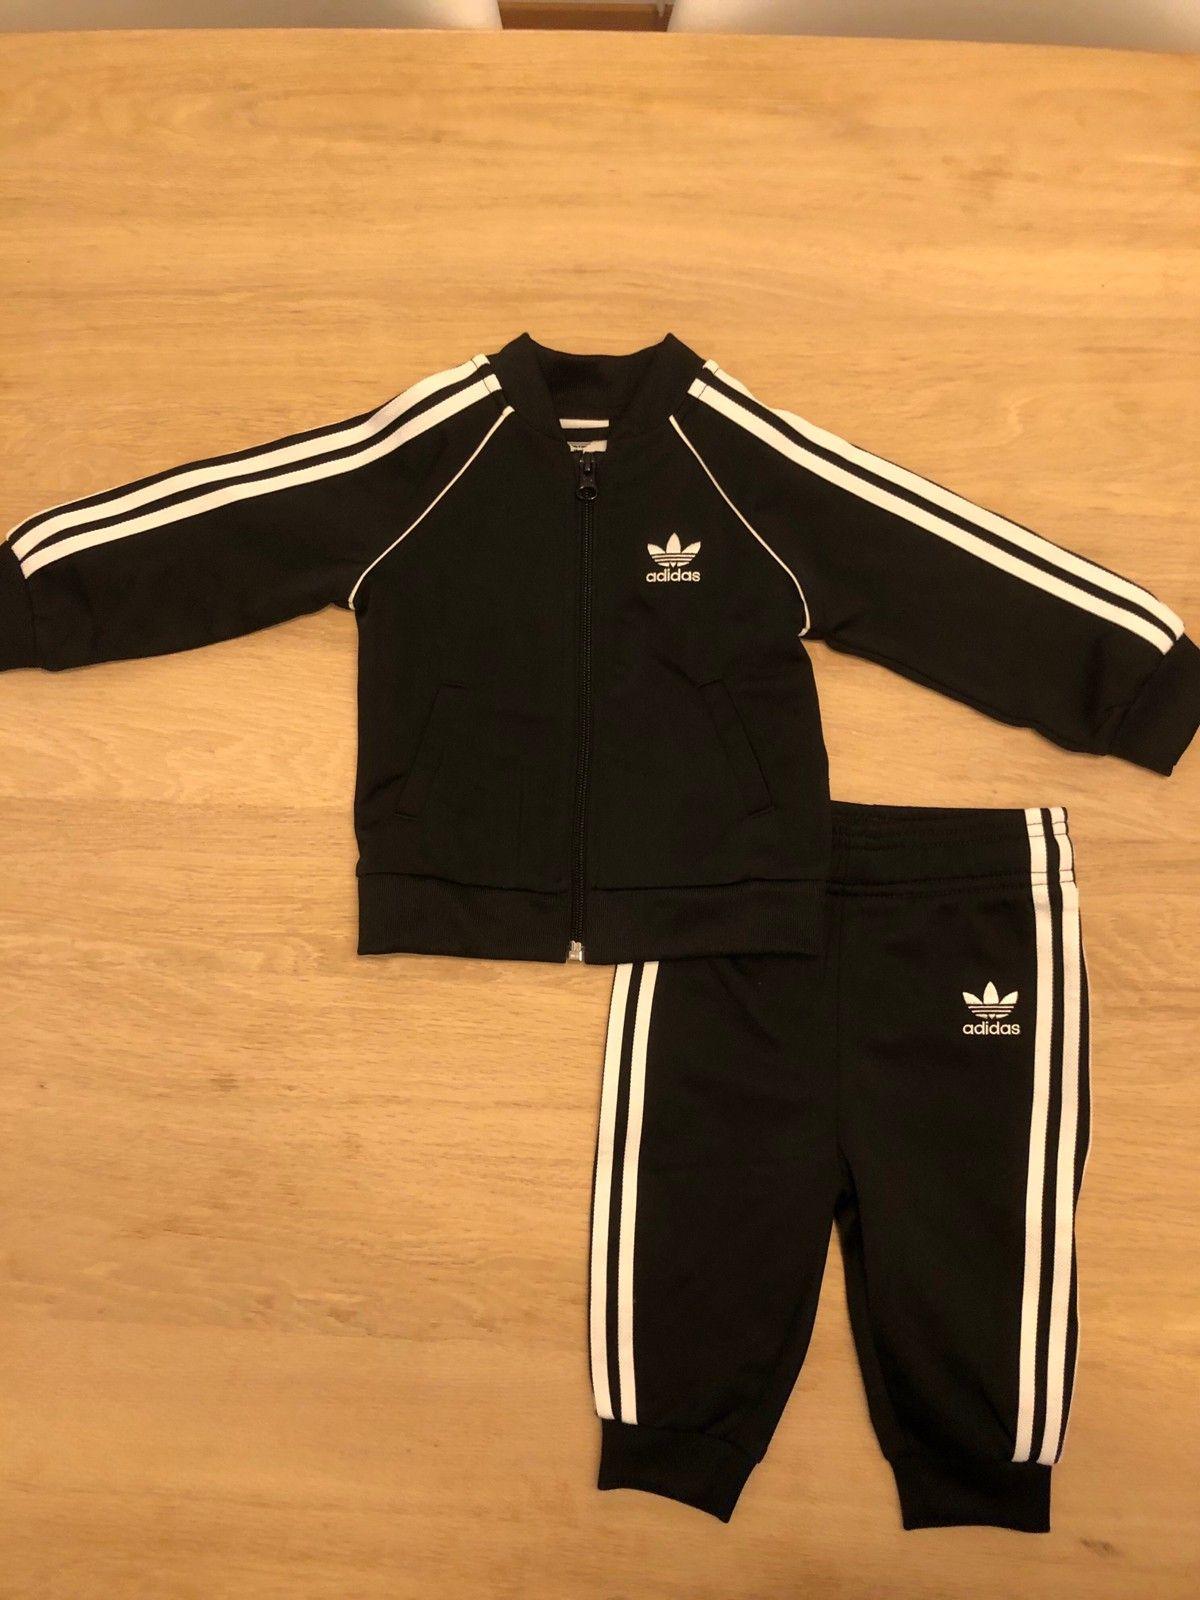 Adidas Originals Tracksuit Set Treningsdress Black White